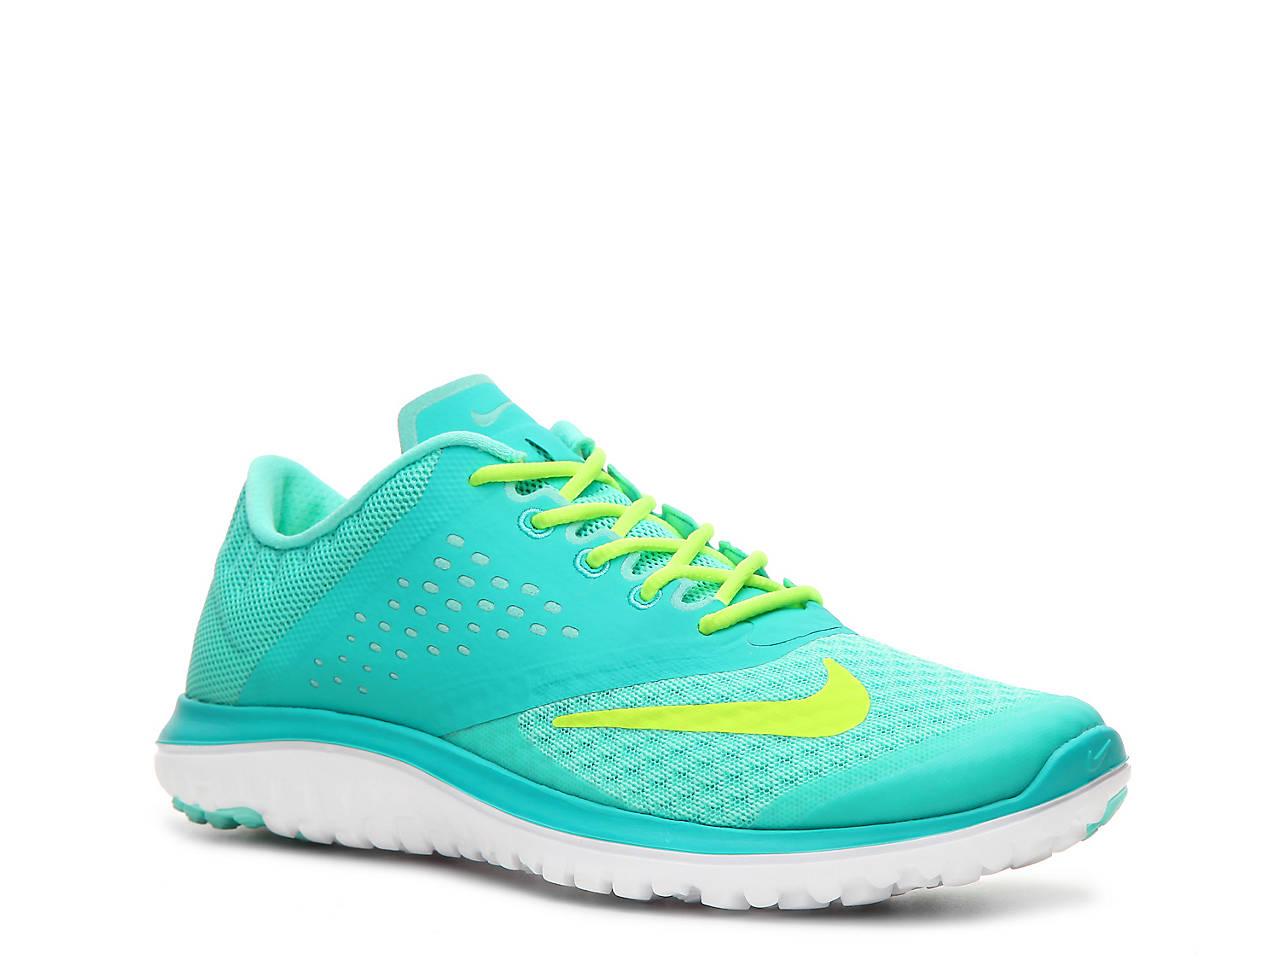 Nike FS Lite Run 2 Lightweight Running Shoe Women's Women's Shoes